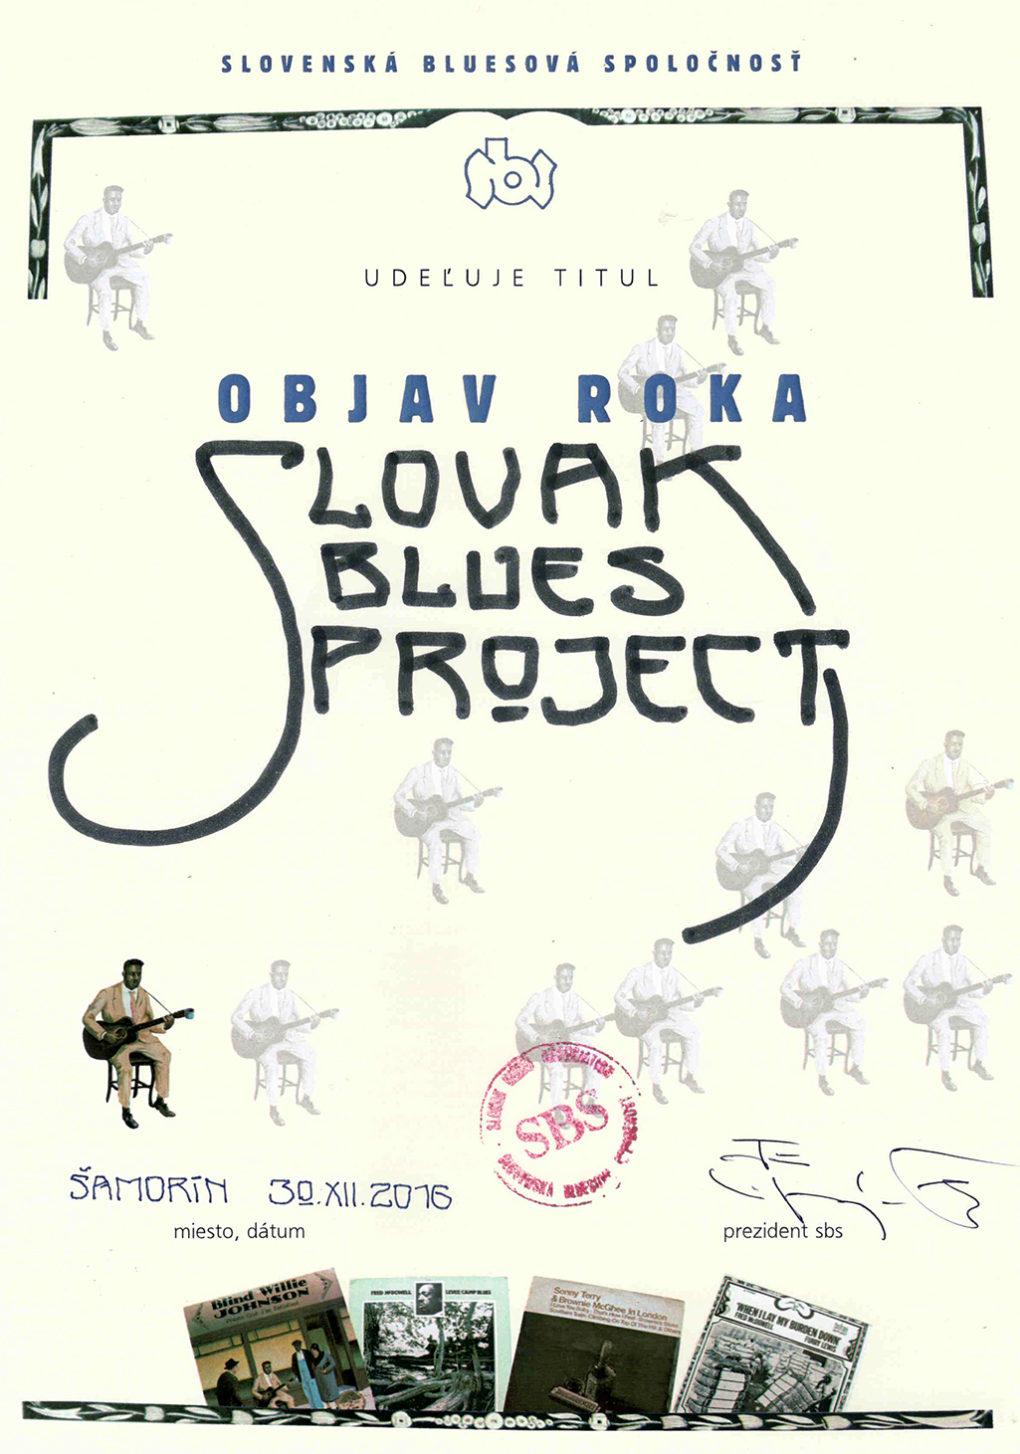 Slovak Blues Project získal cenu Objav roka 2016 na Slovensku